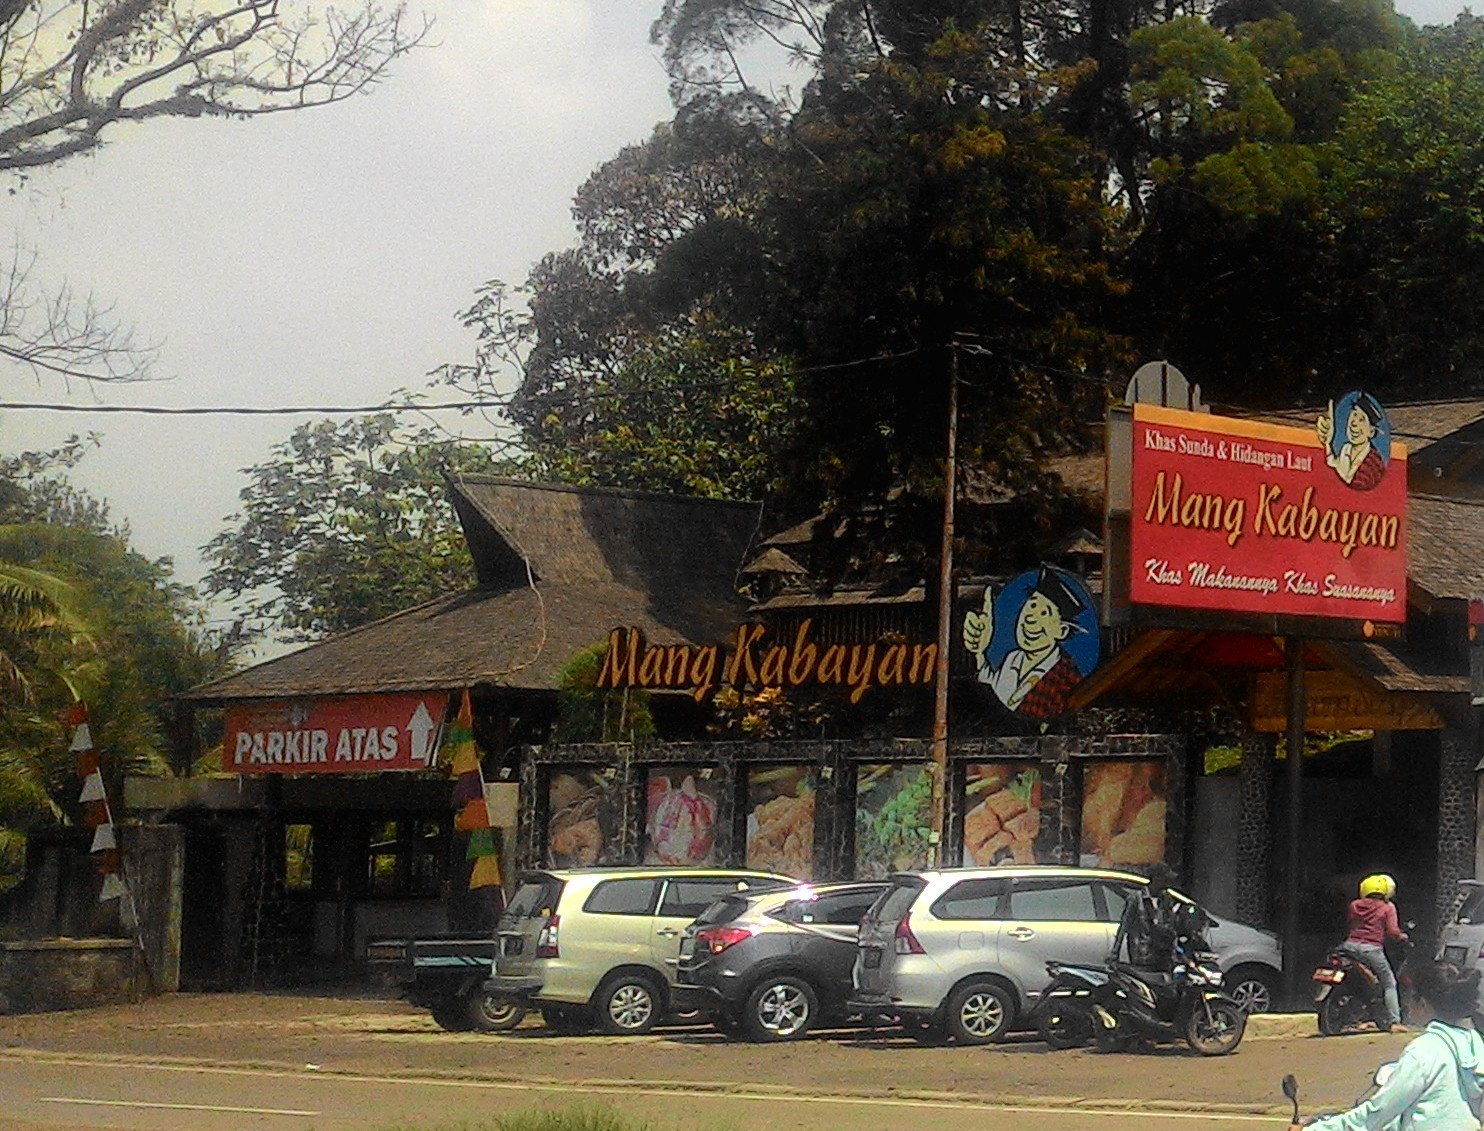 http://mangkabayan68.blogspot.co.id/2016/06/salabenda-bogor.html